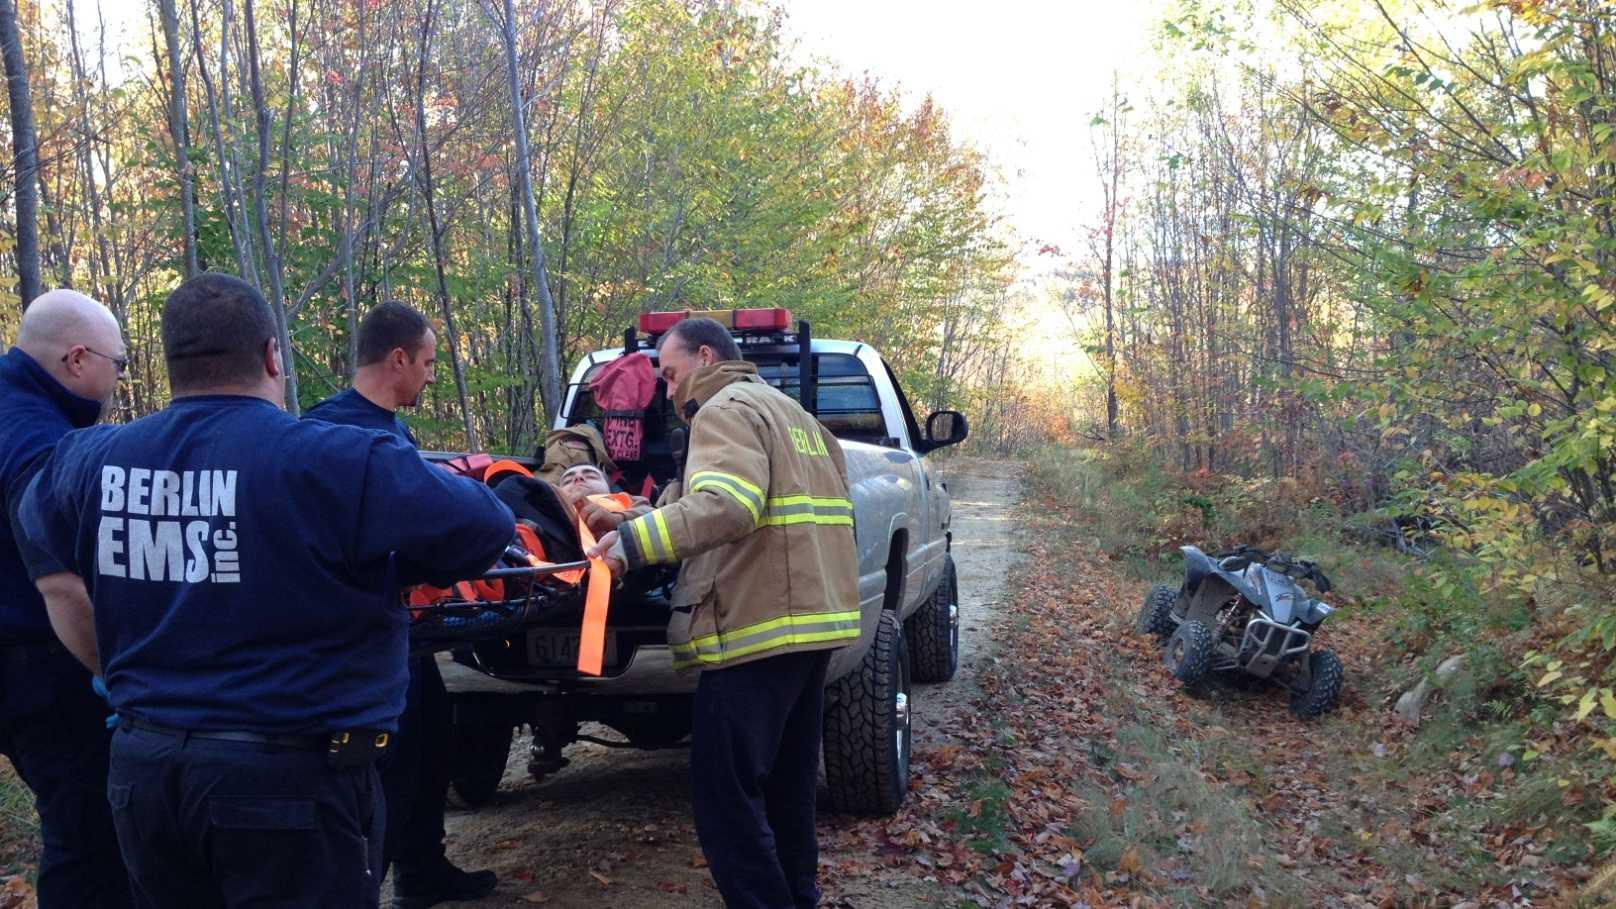 Berlin EMS transporter an injured Massachusetts man to the hospital on Sunday.